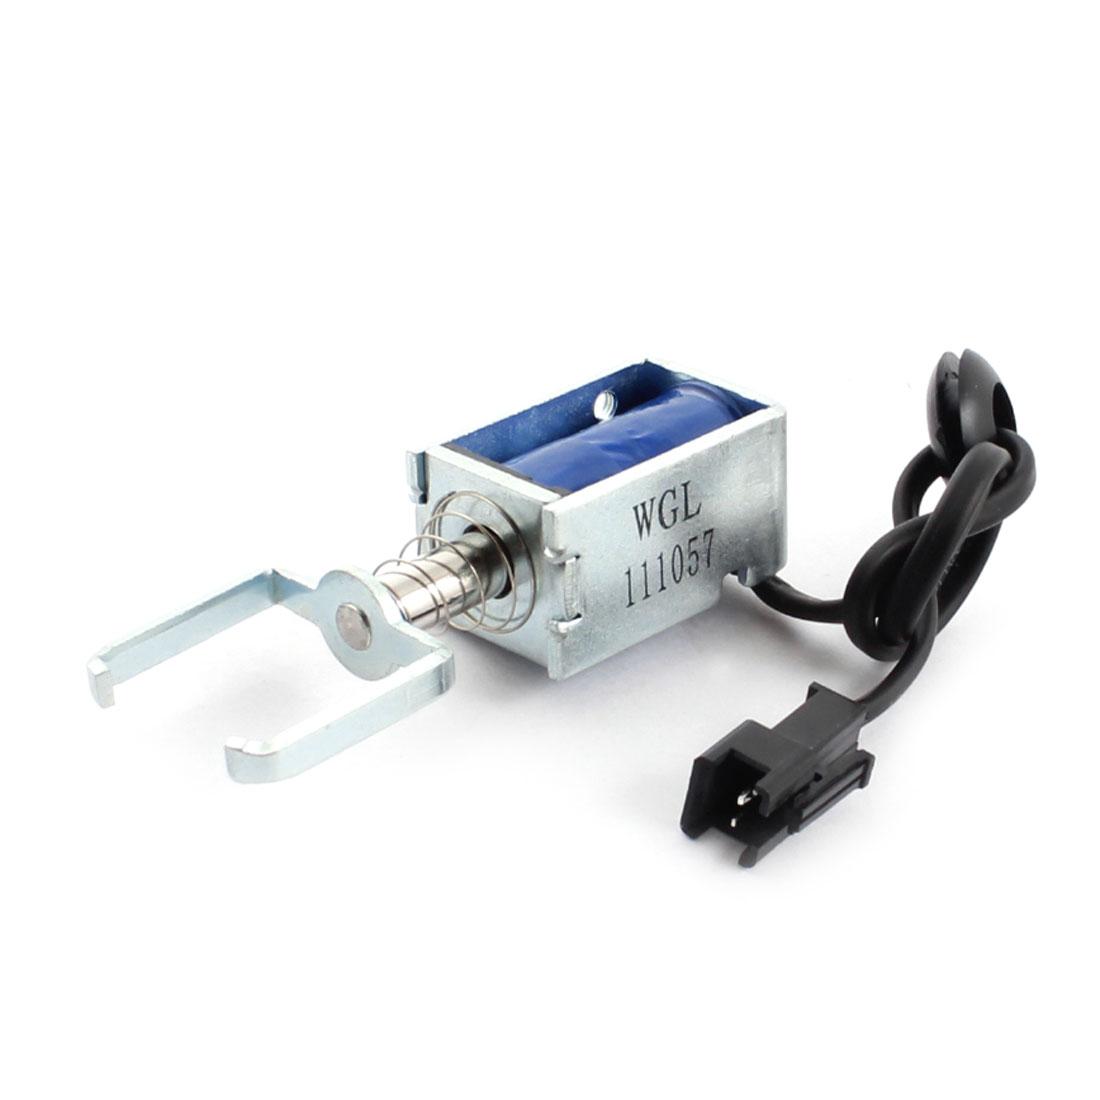 DC 12V 100g/6mm Open Frame Actuator Linear Pull Solenoid Electromagnet